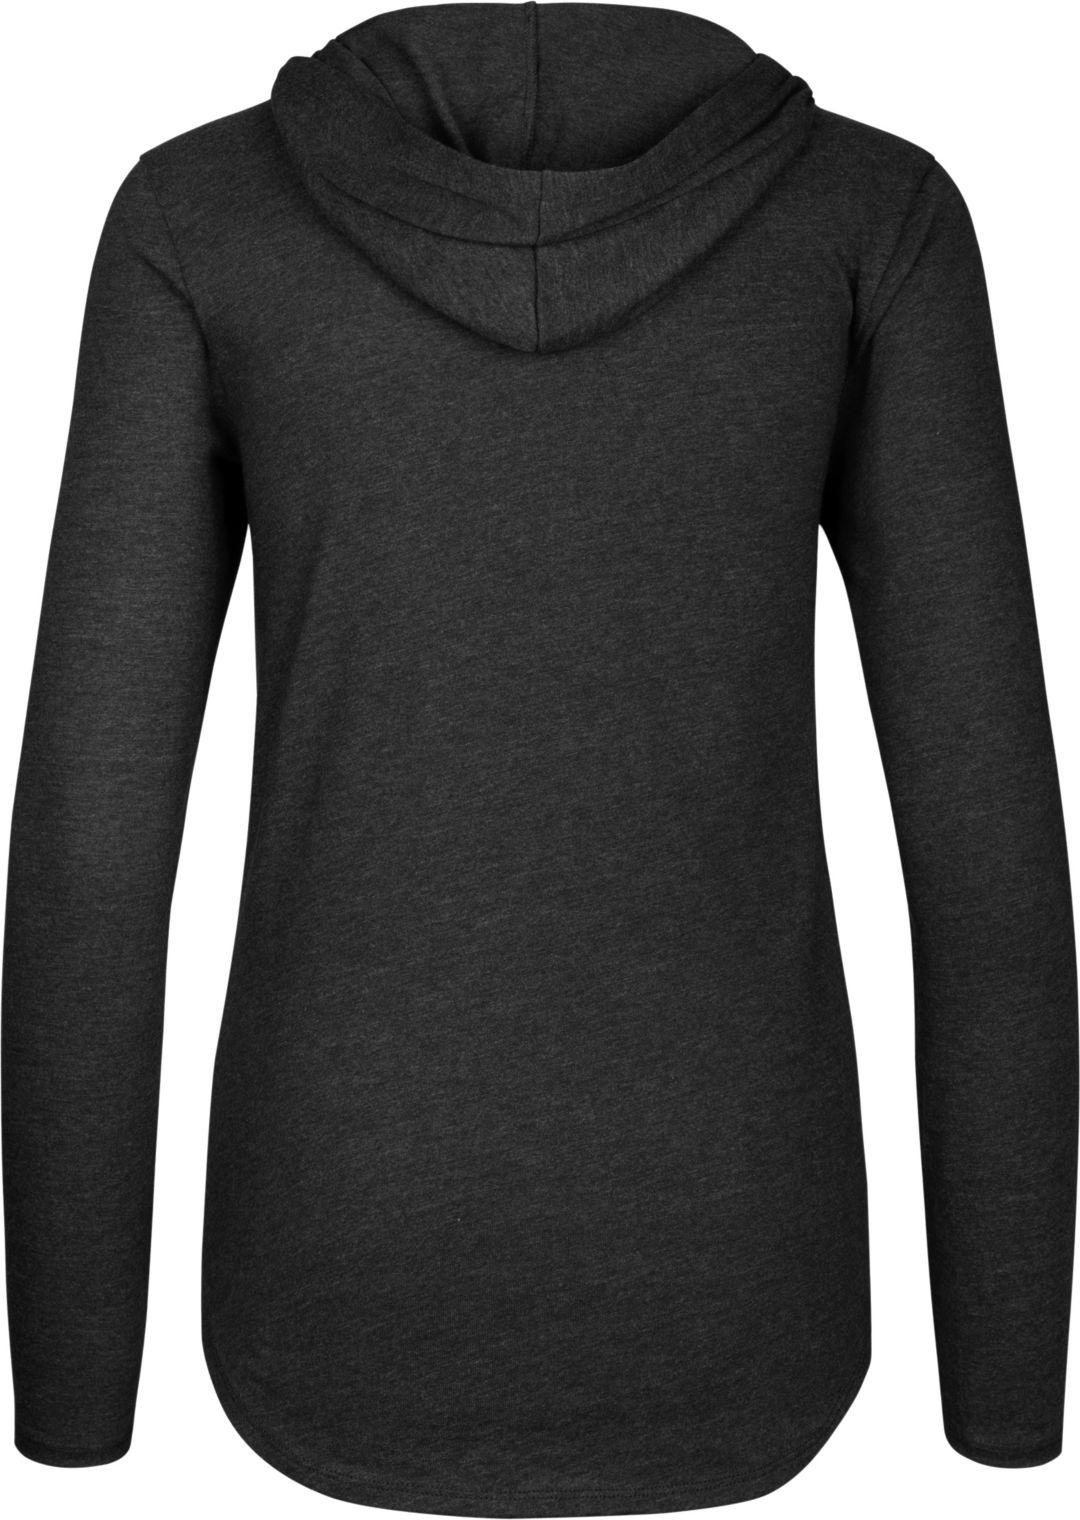 69131b1c '47 Women's Atlanta Falcons Club Black Hooded Long Sleeve Shirt